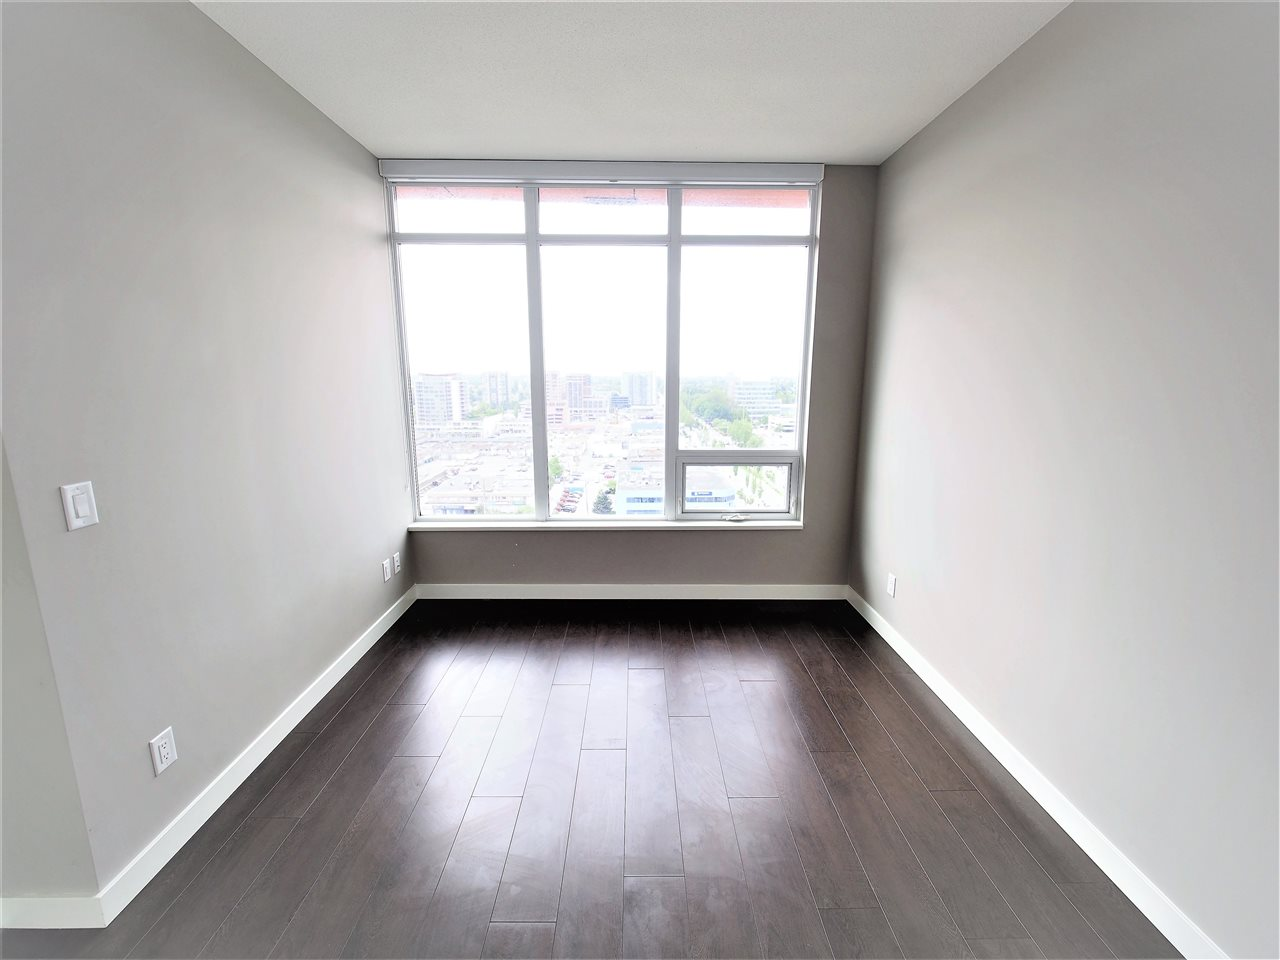 Condo Apartment at 1807 6288 NO 3 ROAD, Unit 1807, Richmond, British Columbia. Image 6